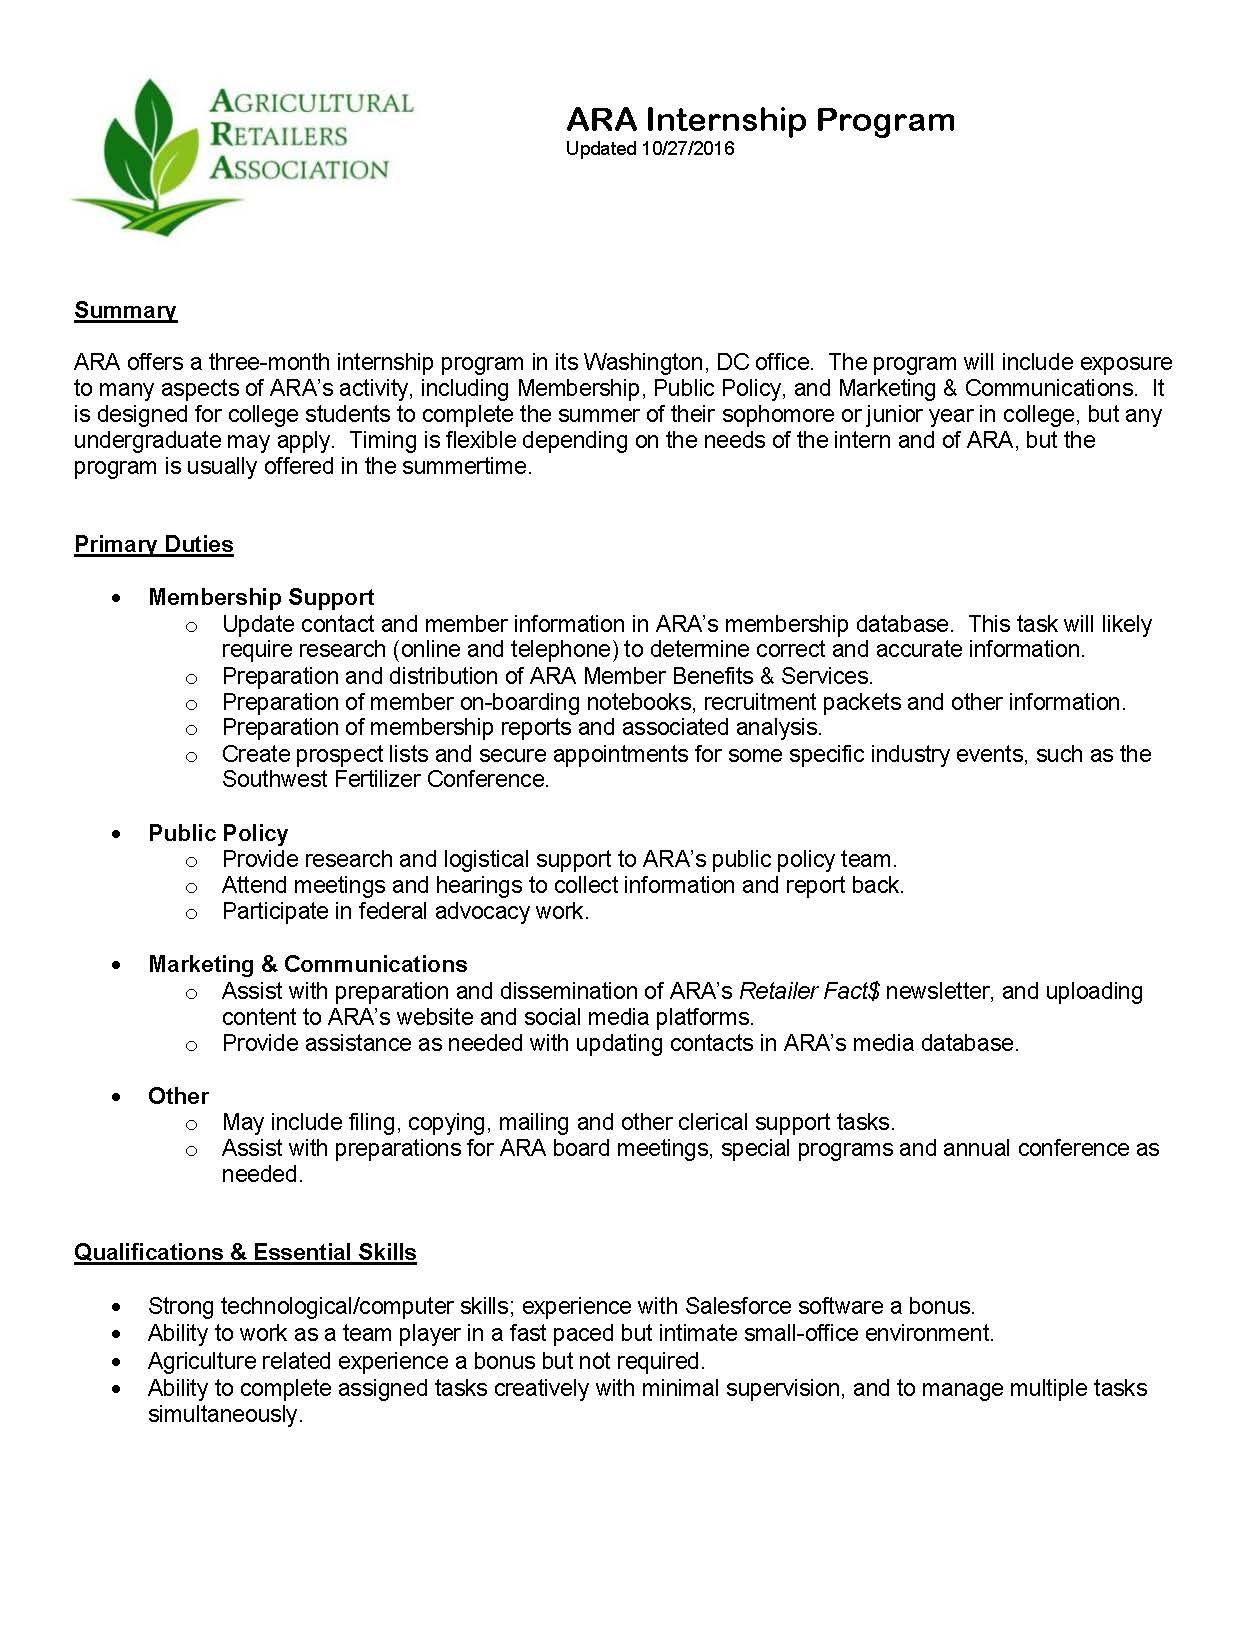 ara-2017-internship-program-final_page_1